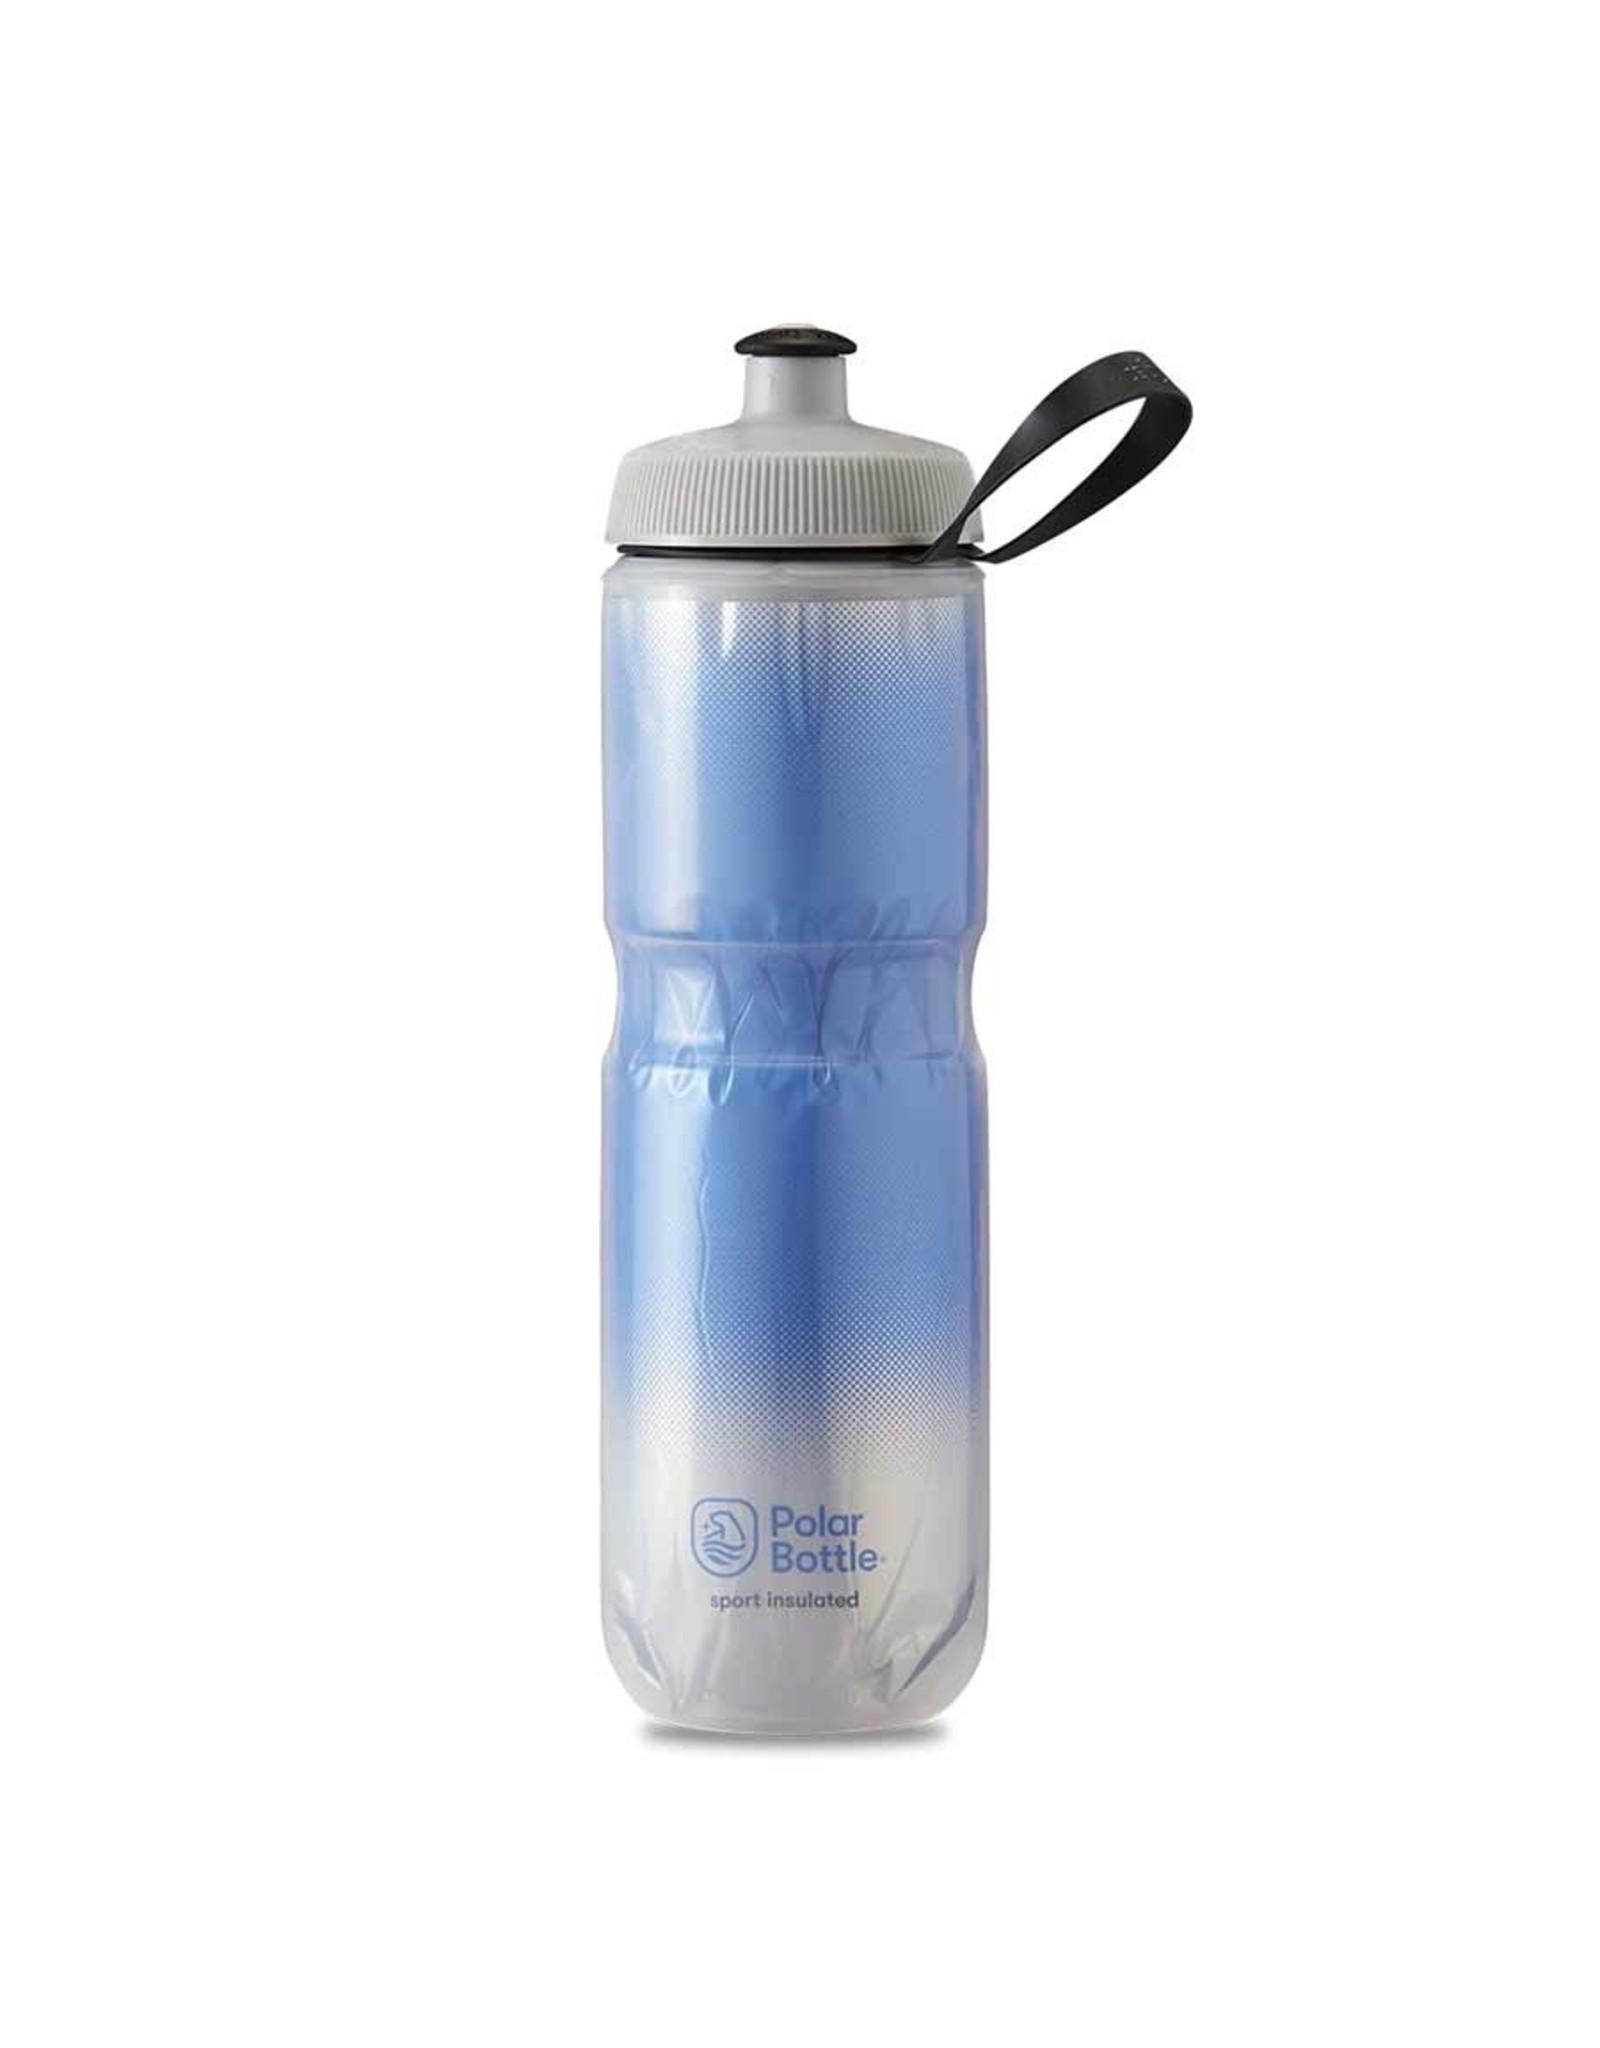 Polar Bottle Polar - Sport Insulated 24oz, Water Bottle, 710ml / 24oz, Royal Blue/Silver